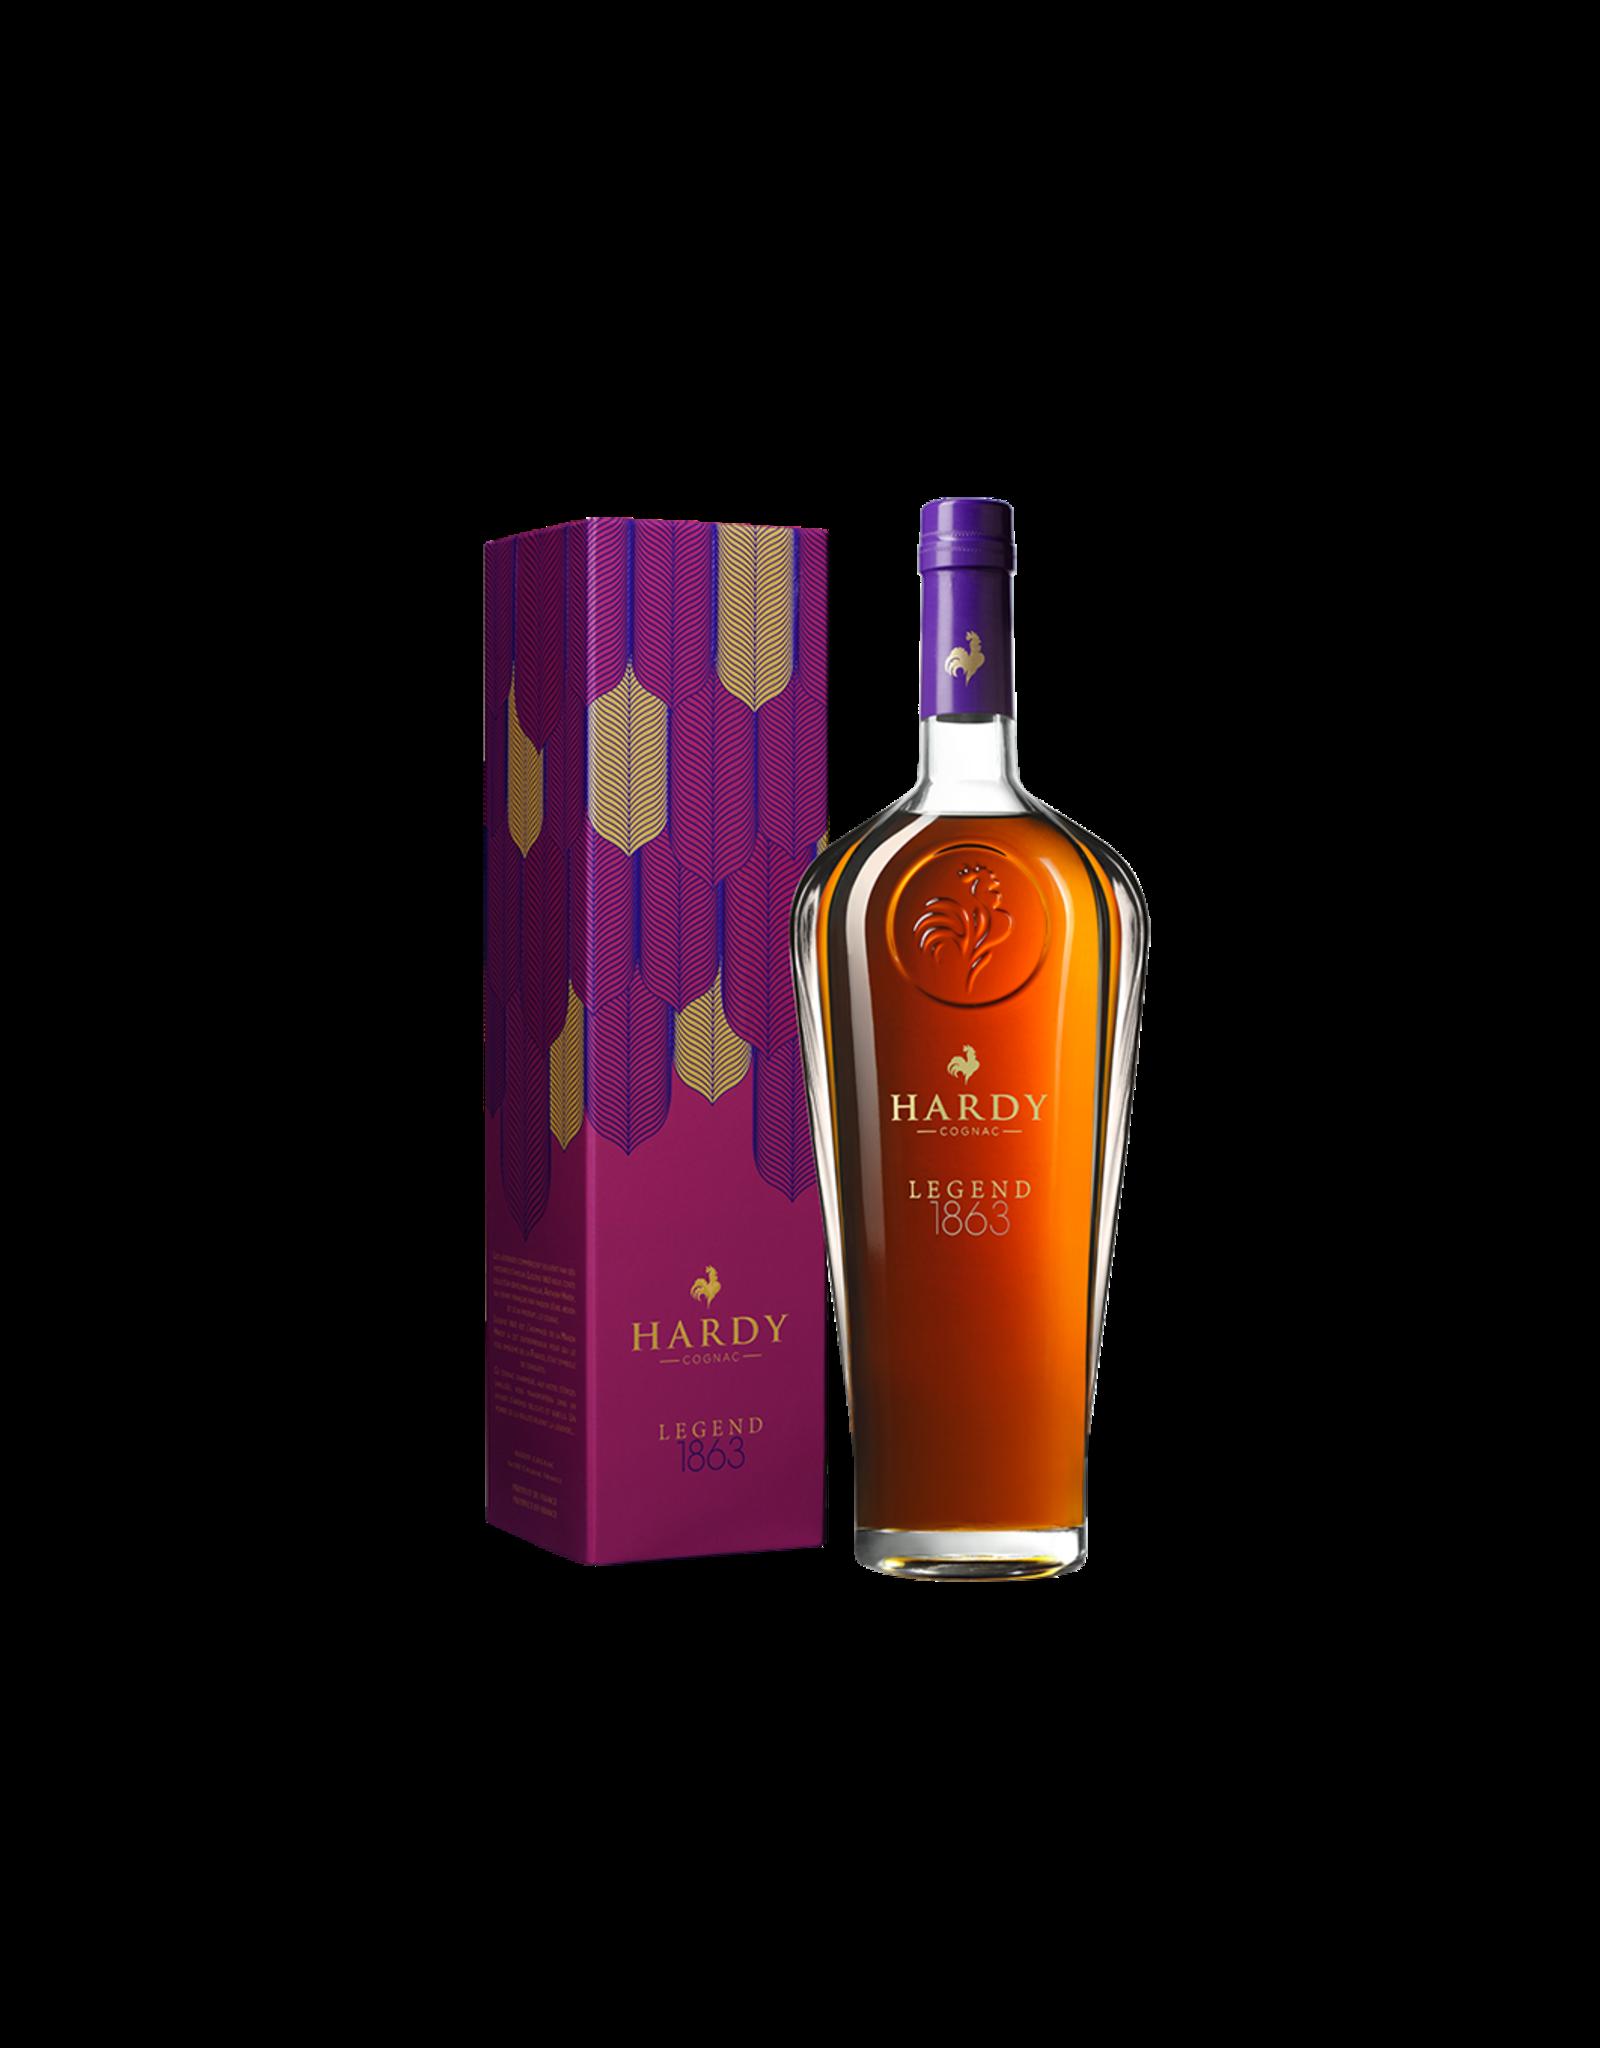 Hardy Cognac Legend 1863